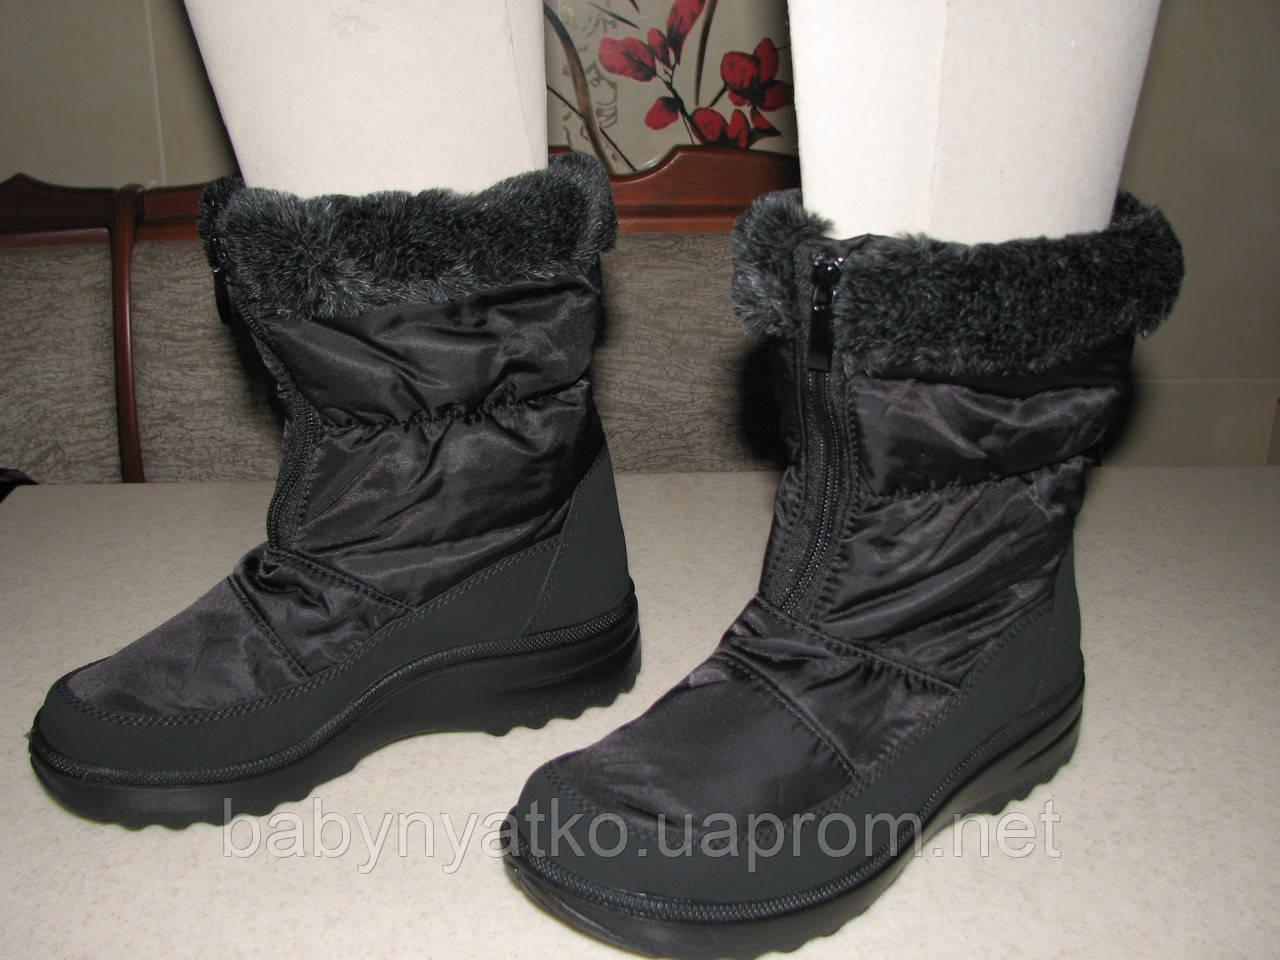 1a8897a0a Тигина сапоги-дутики зимние женские р.37,39,40,41 черные, цена 1 275 ...